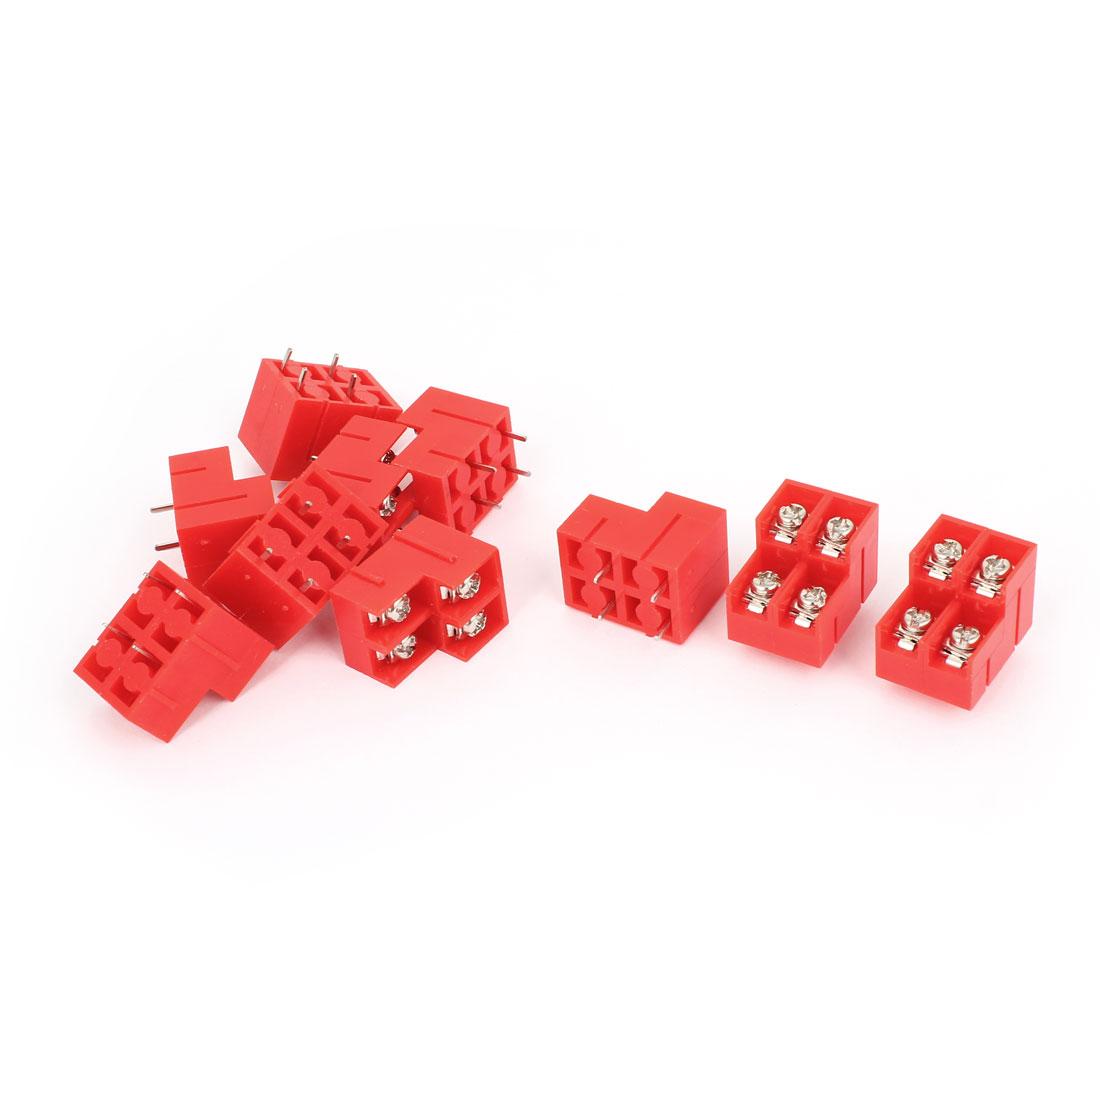 10pcs Red 4 Pin 8.5mm Spacing Pluggable PCB Screw Terminal Block AC 250V 10A